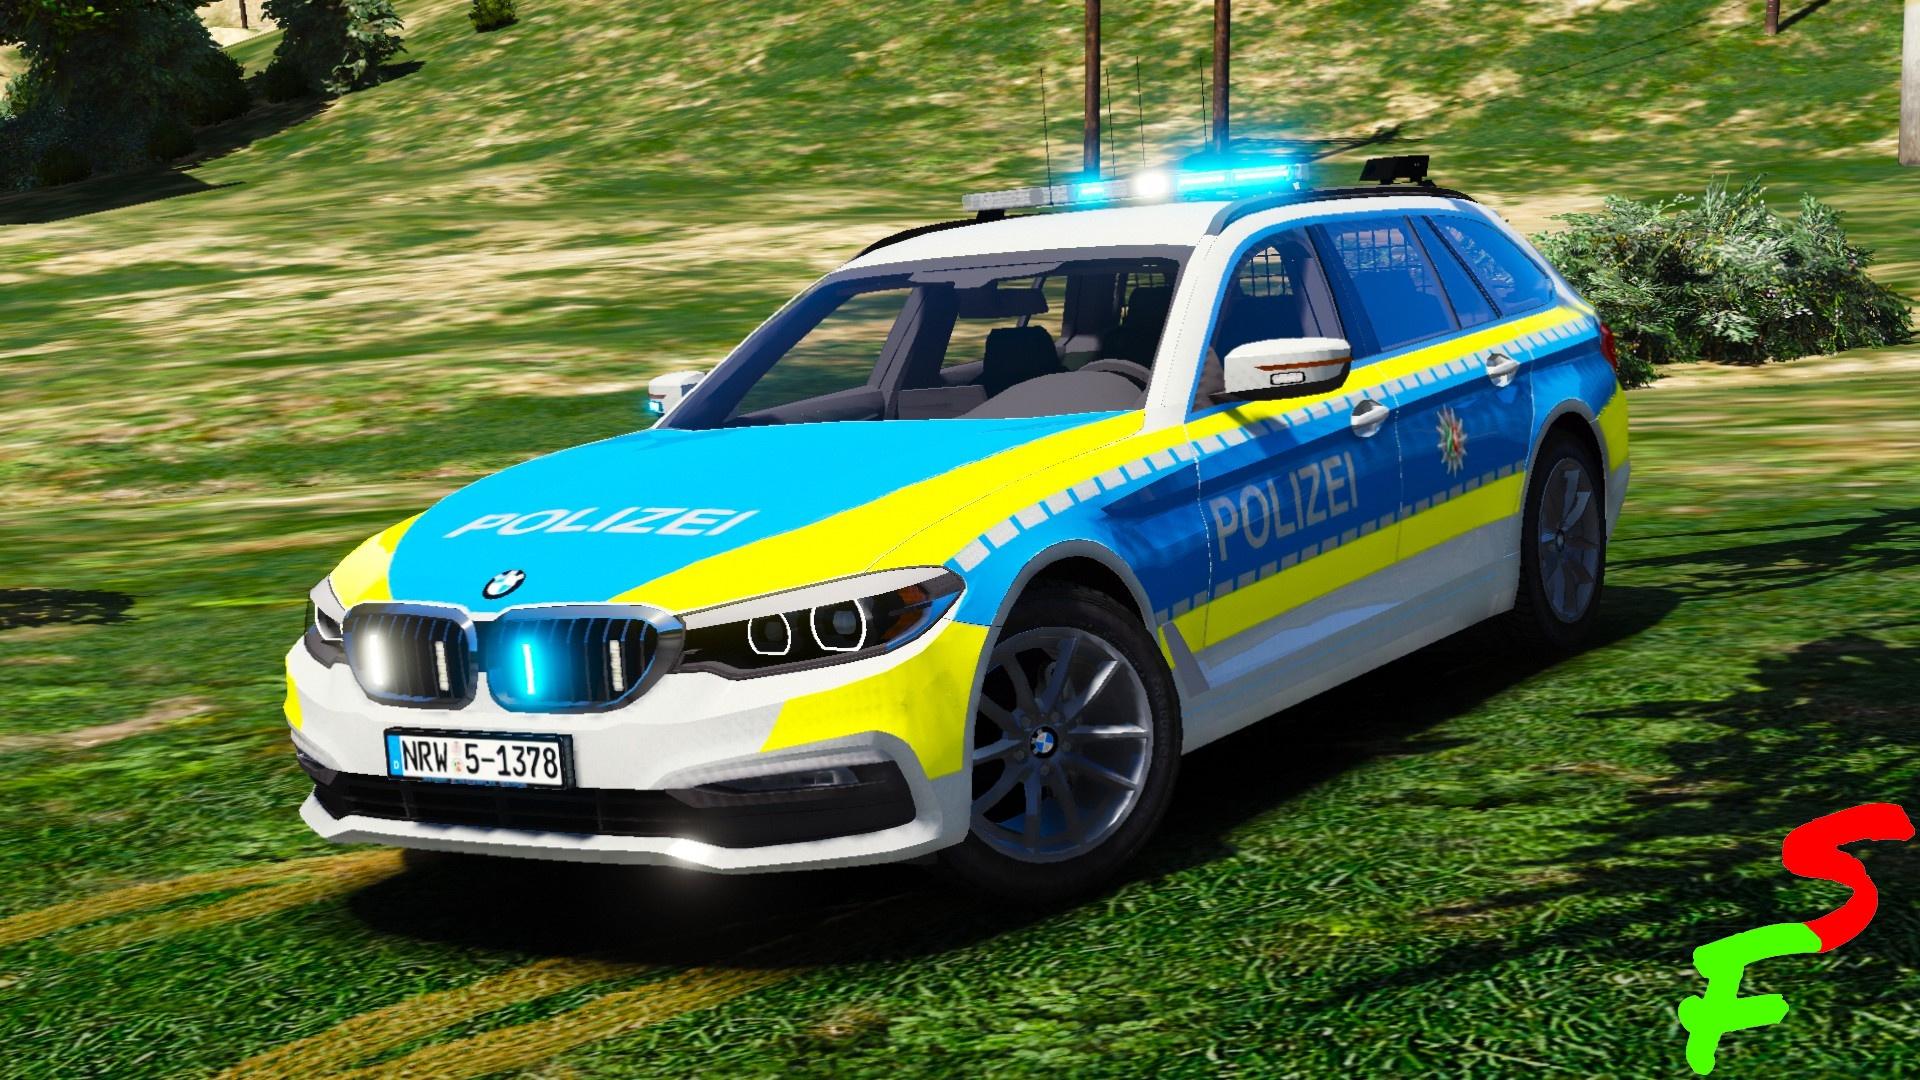 Serie Polizei